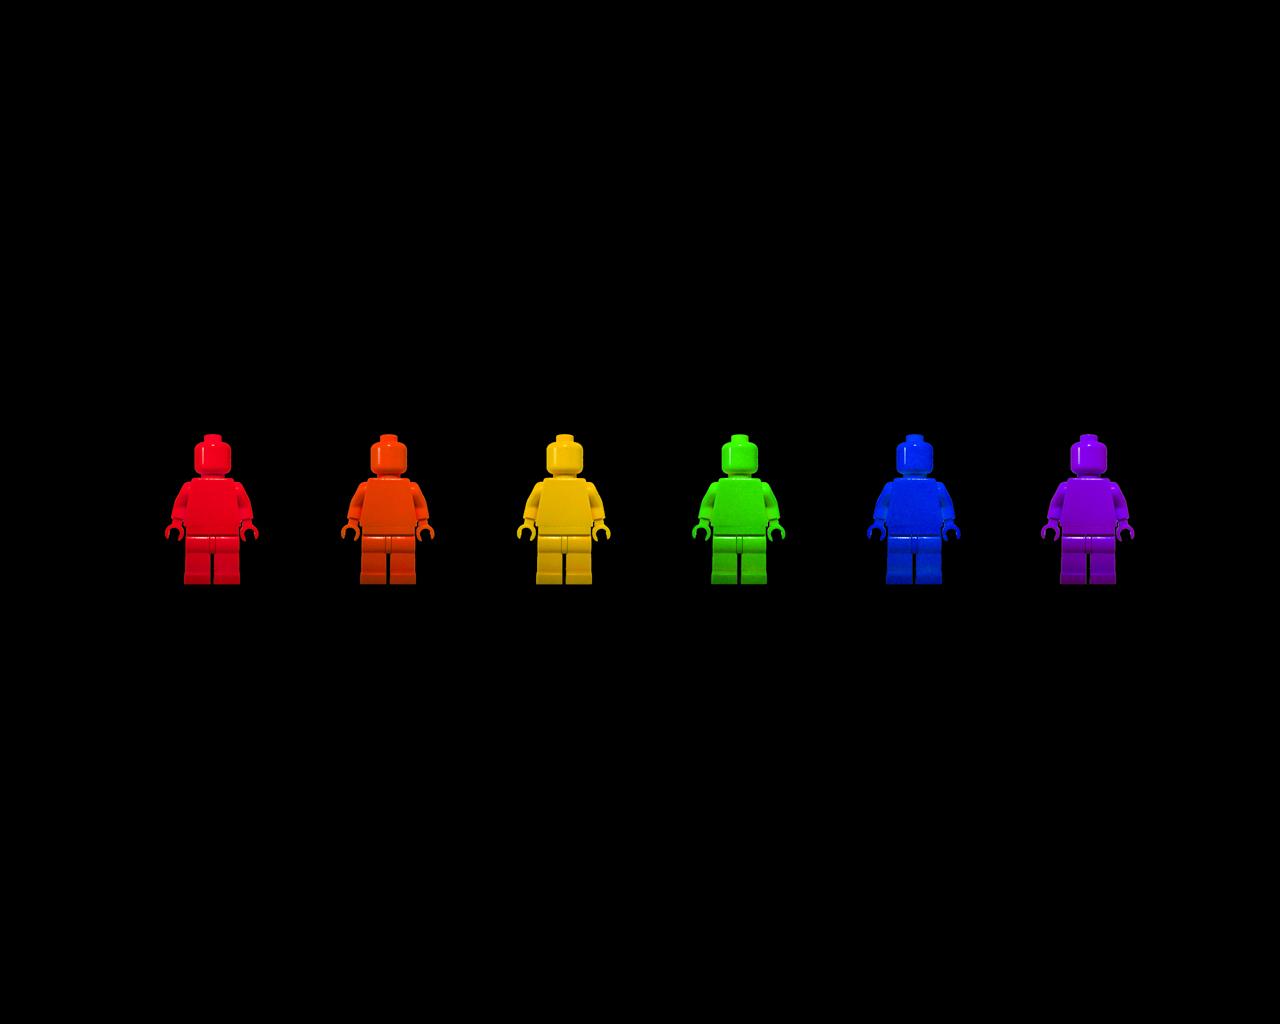 wallpaper rainbow lego man creative lego